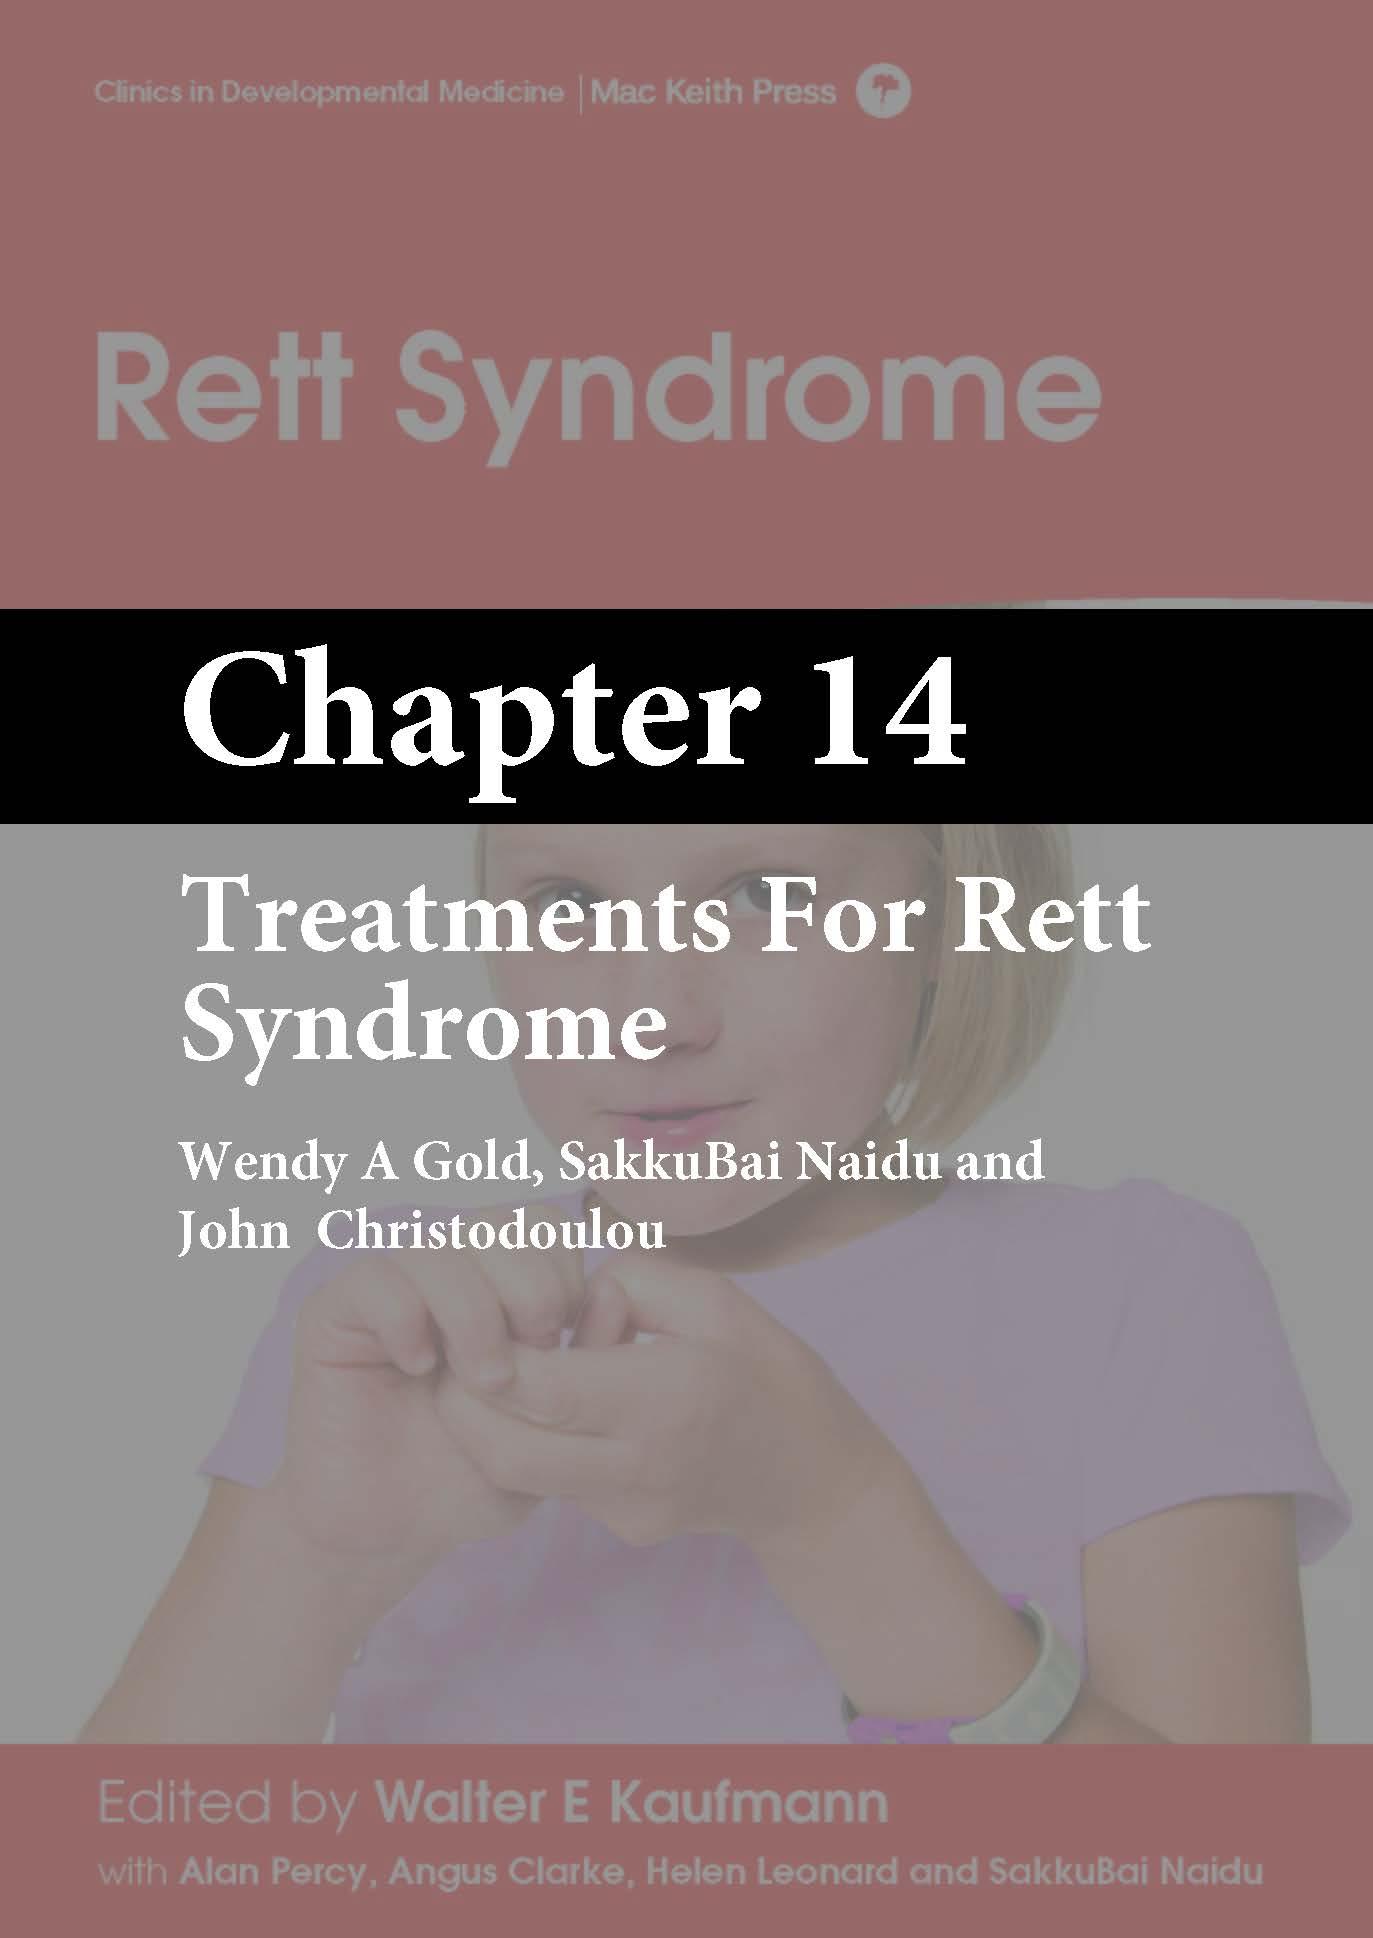 Rett Syndrome, Kaufmann, Chapter 14 cover